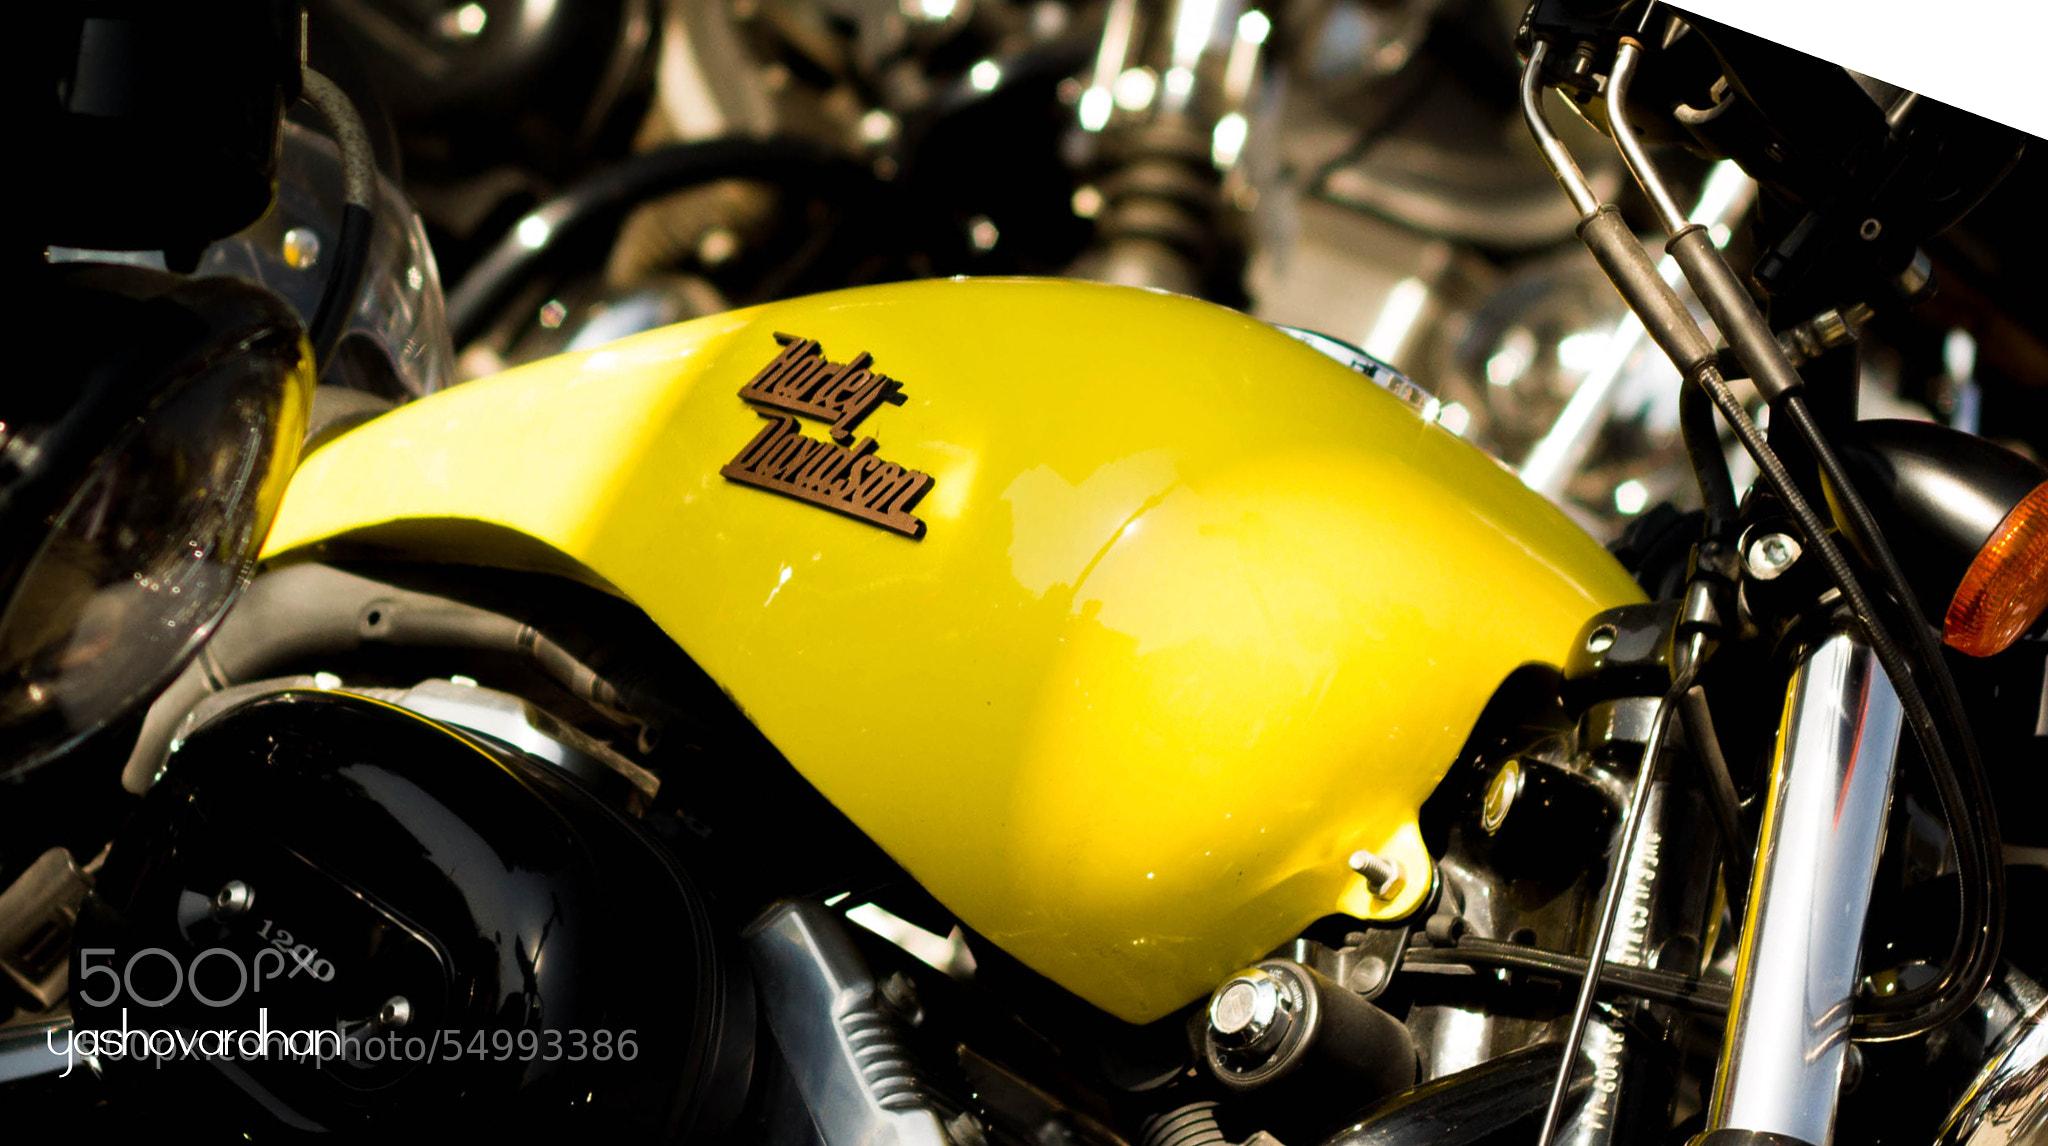 Photograph Harley by Yashovardhan Sodhani on 500px